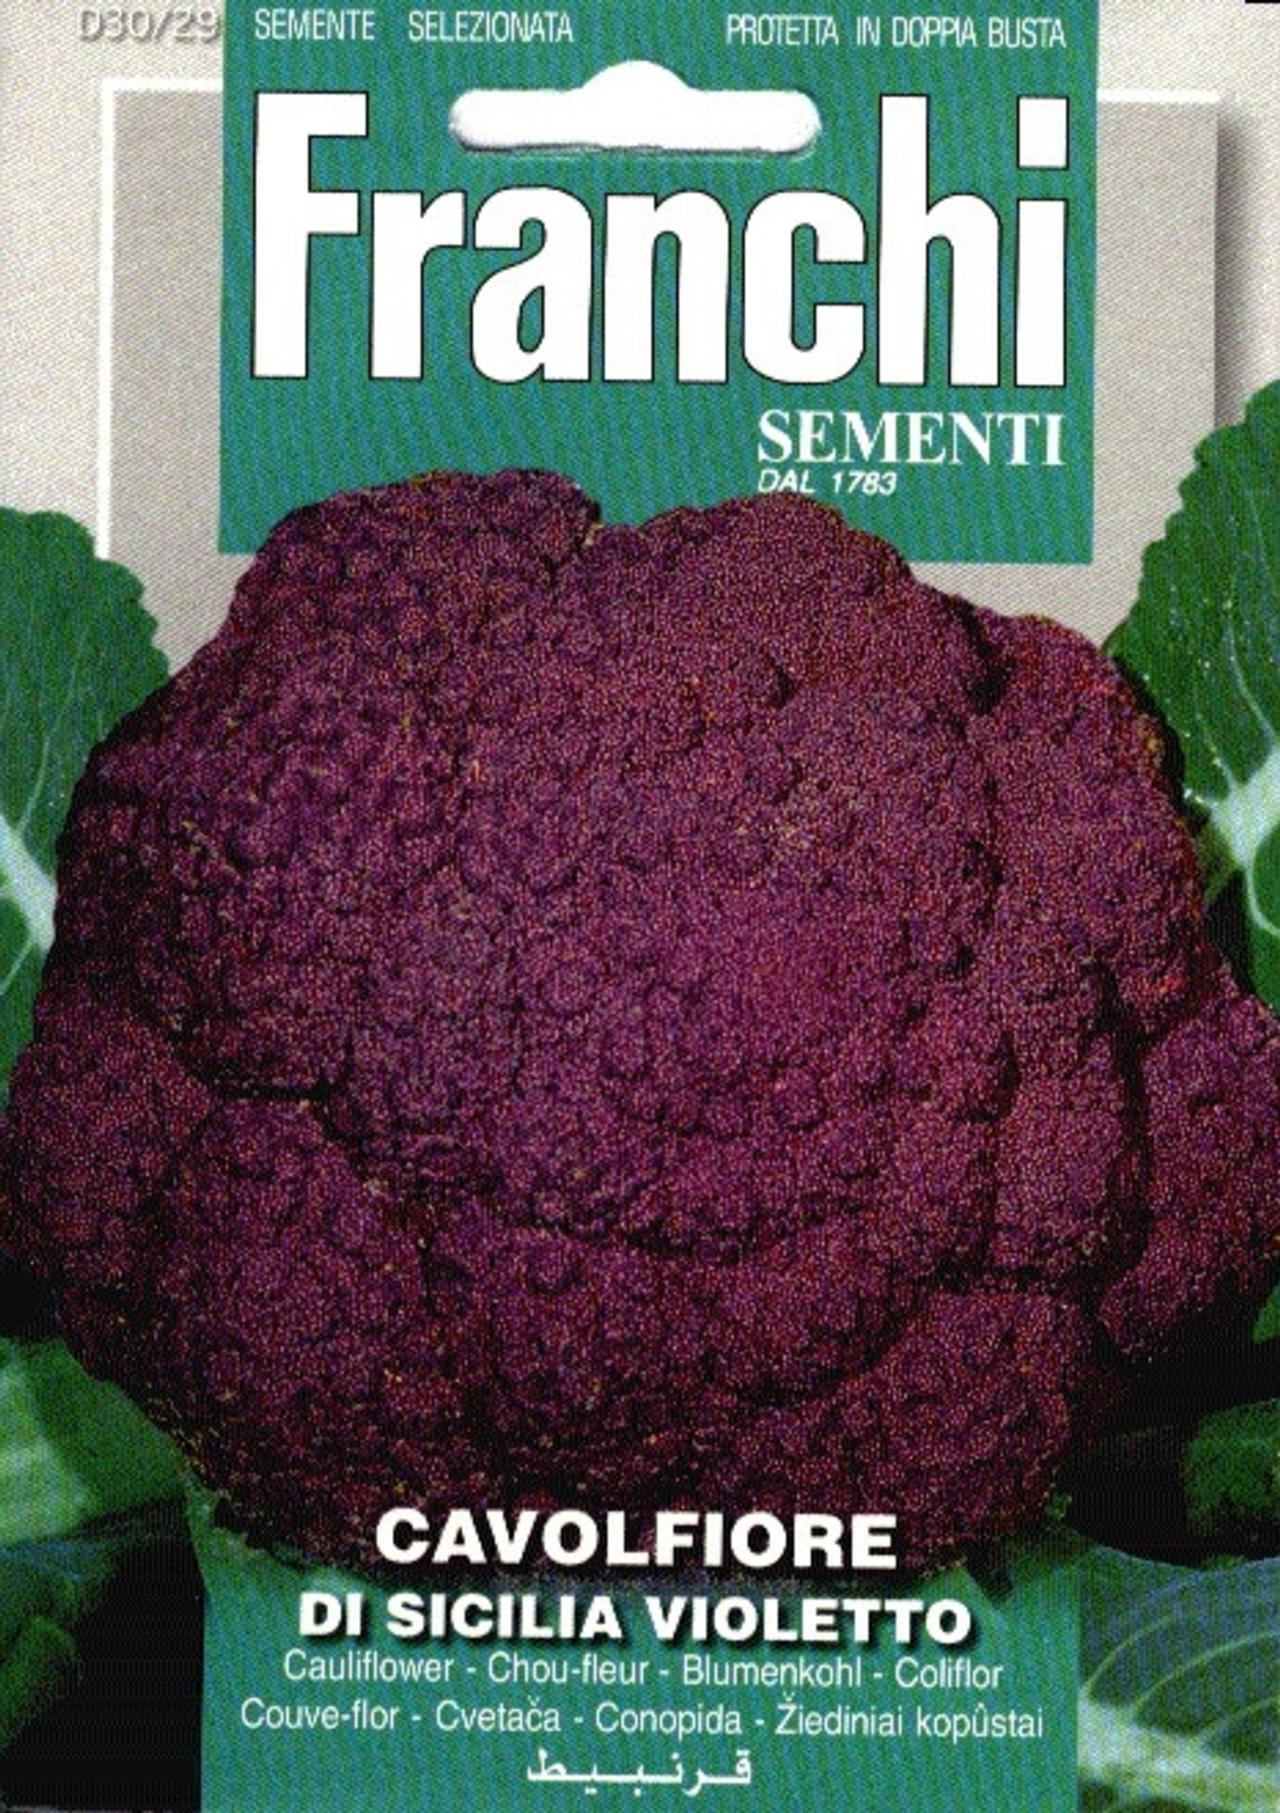 Brassica oleracea 'Violetto' plant